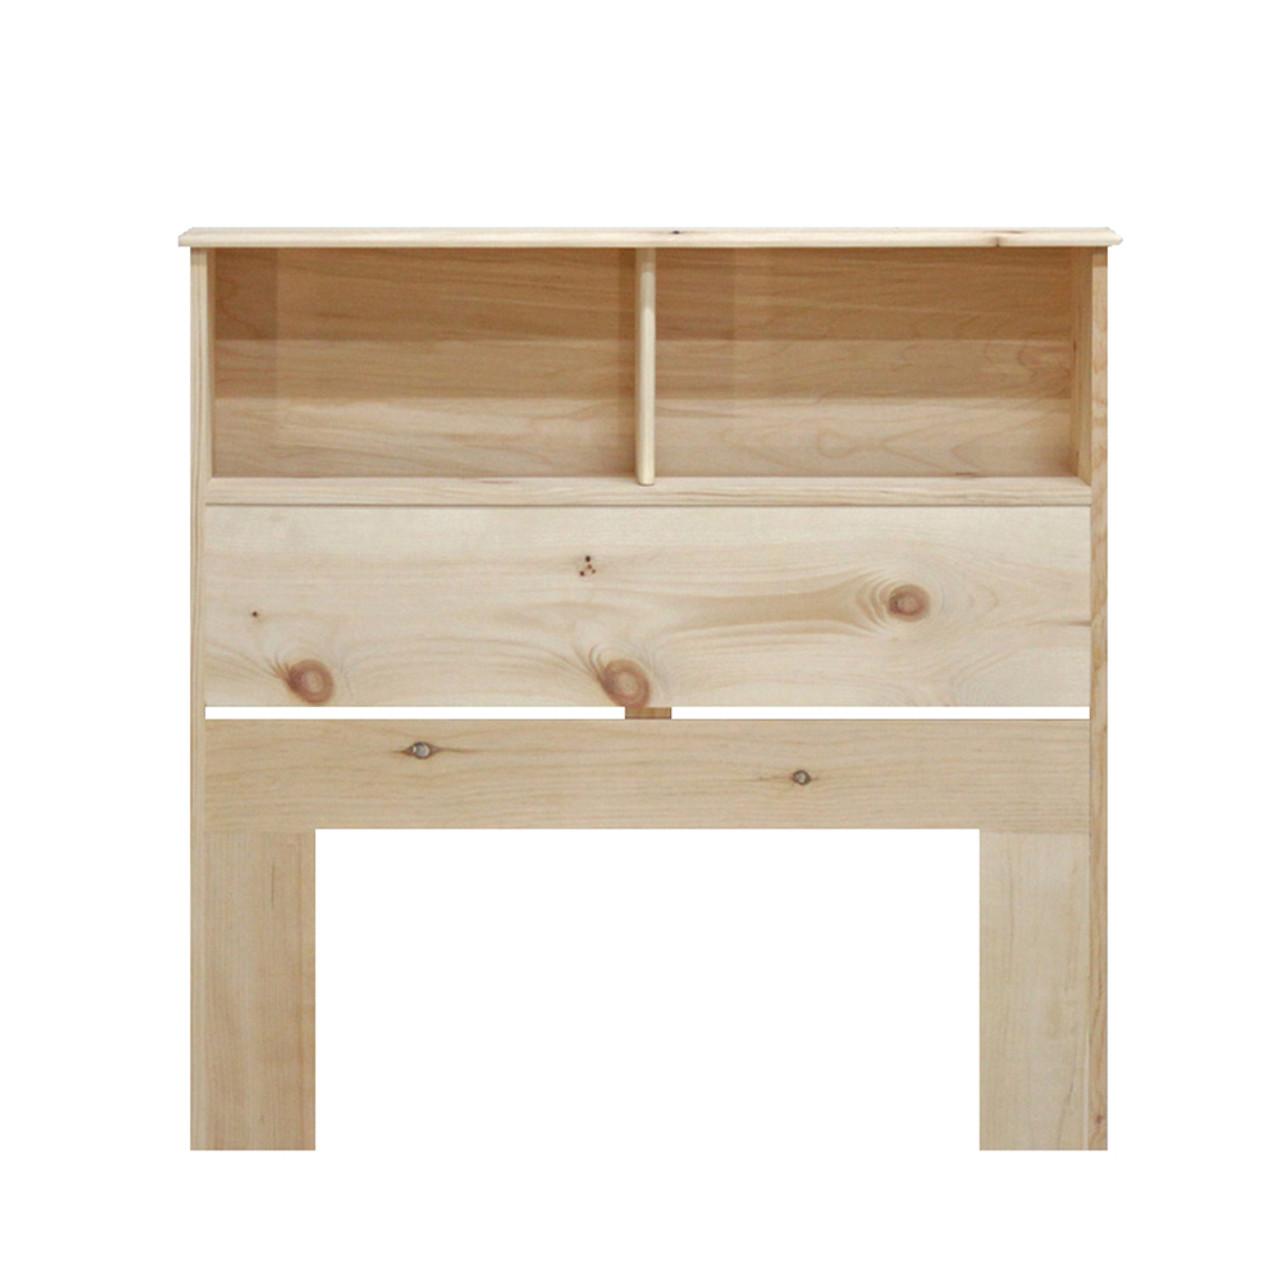 Twin Bookcase Headboard 36 High In Pine Gothic Furniture